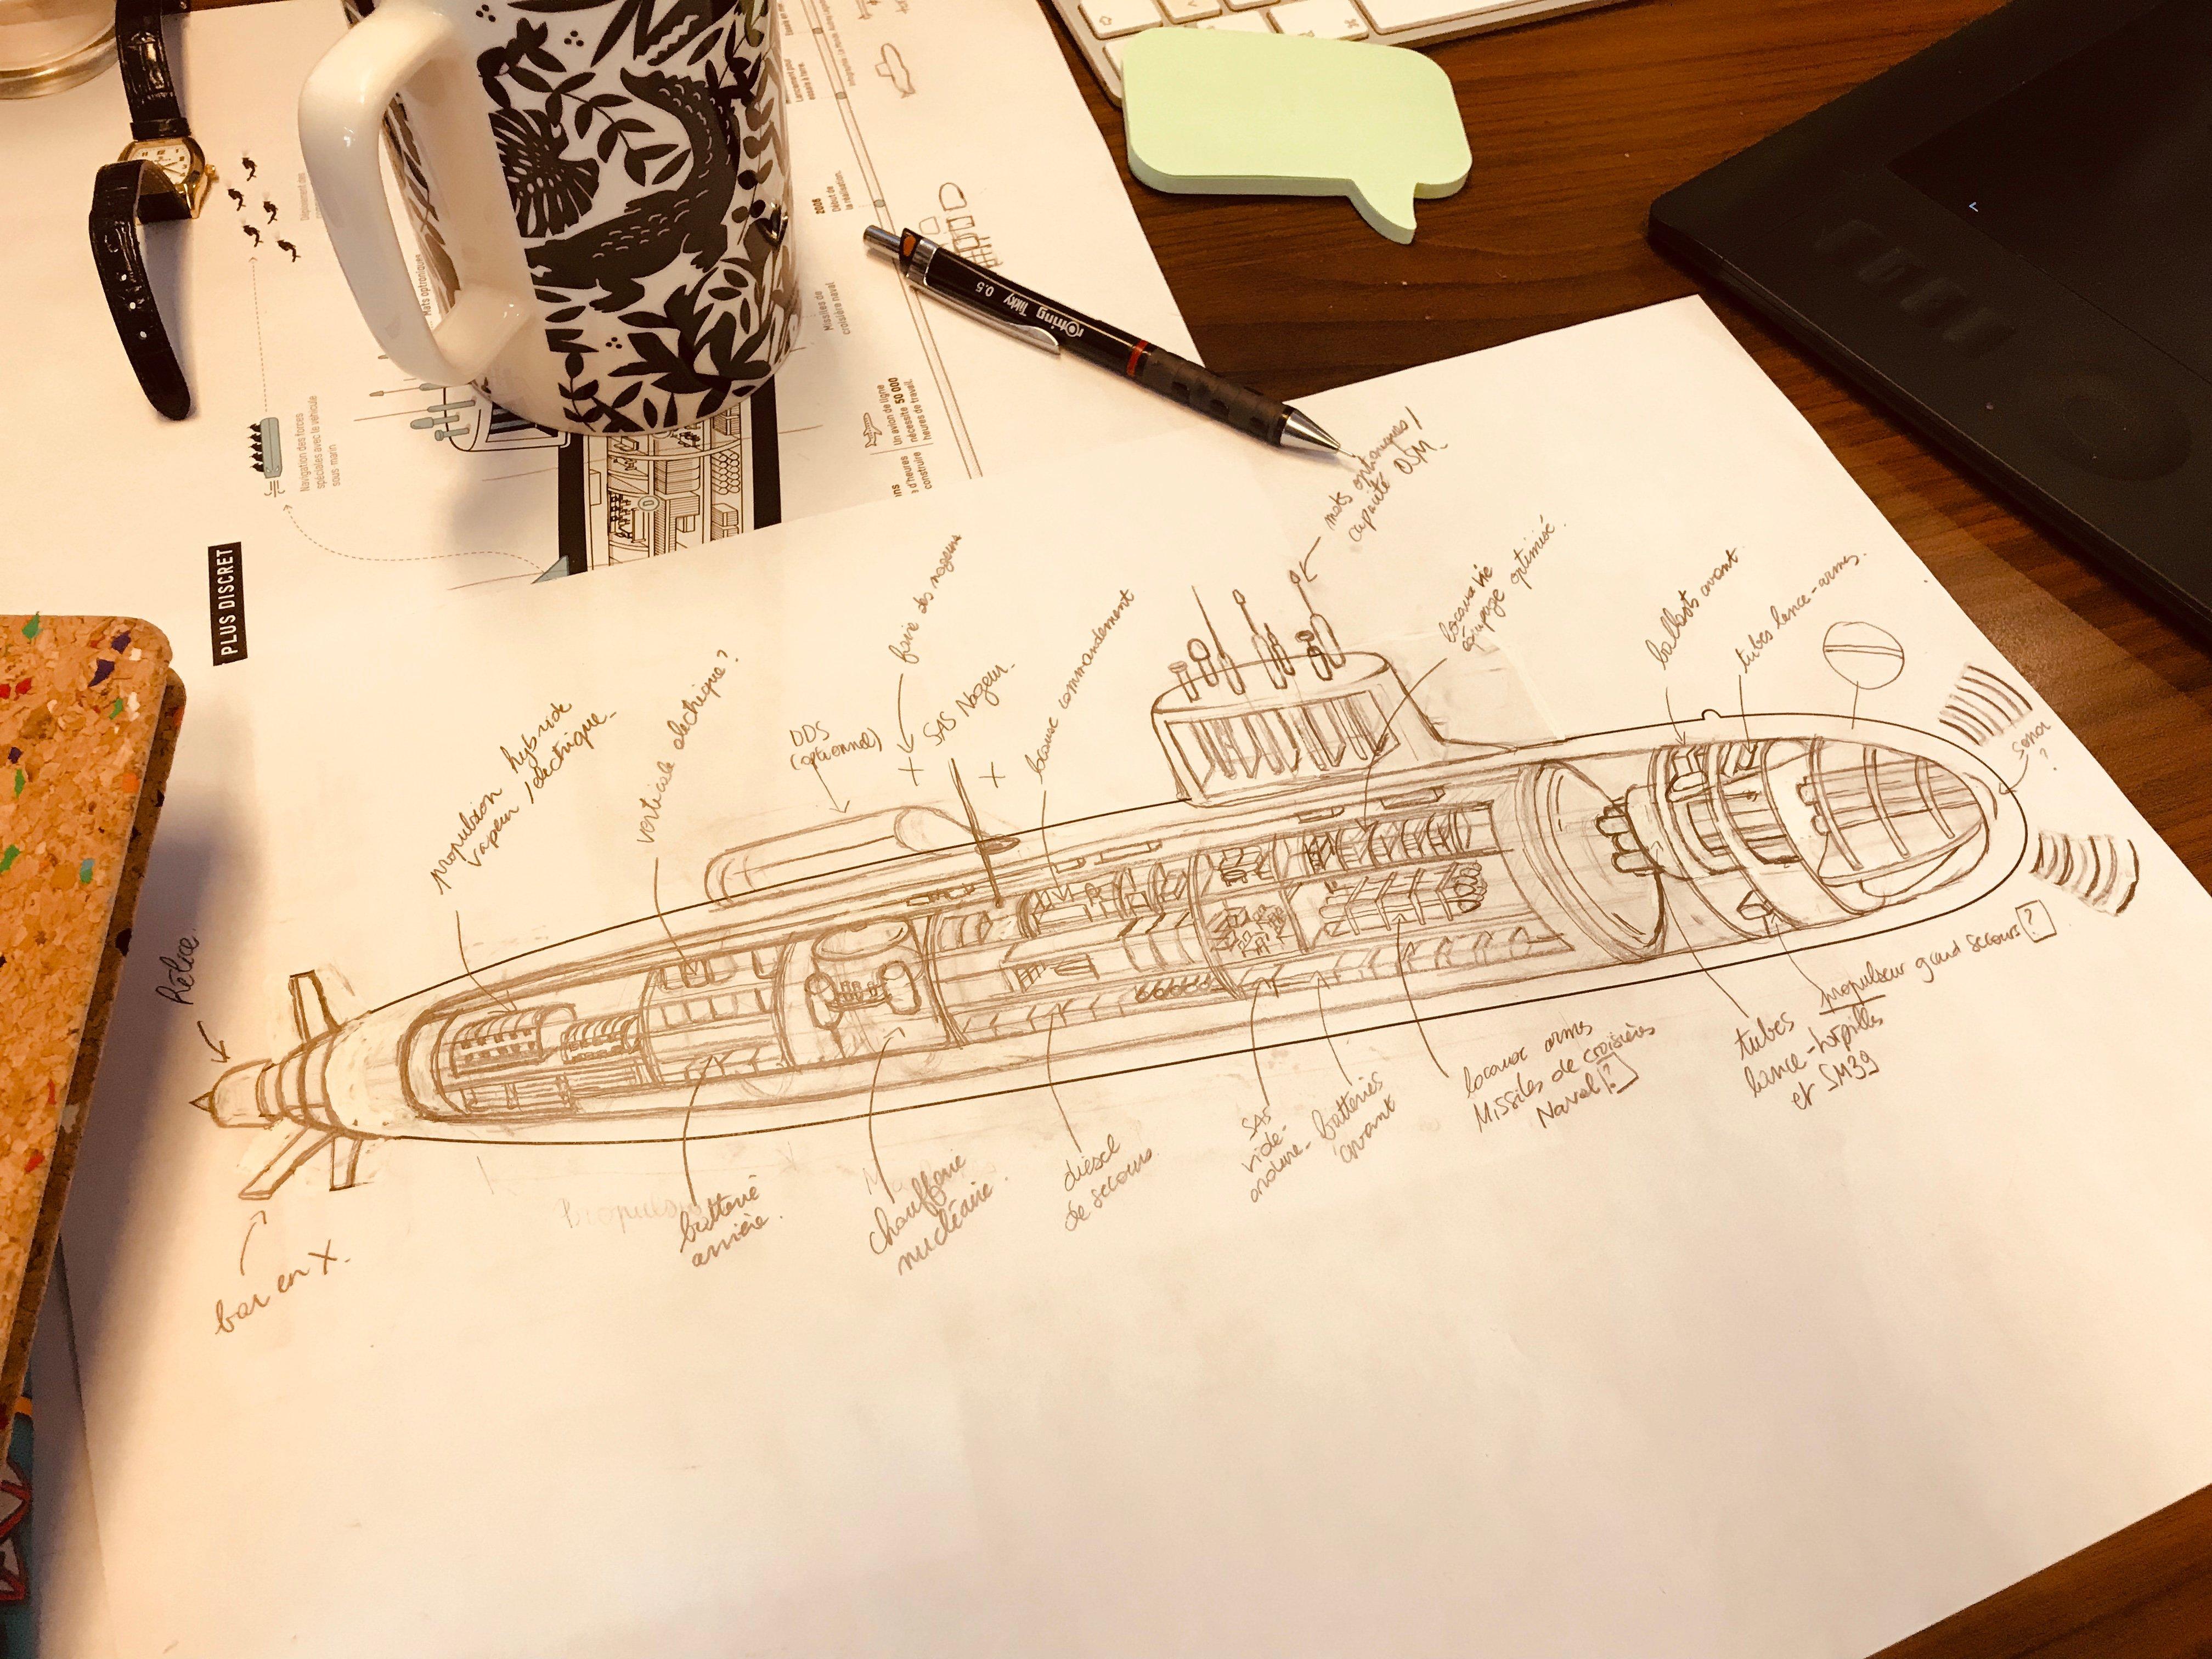 Les futurs sous marins nucléaires d'attaque classe SUFFREN - Page 7 D_McLfzXsAA6JI6?format=jpg&name=4096x4096